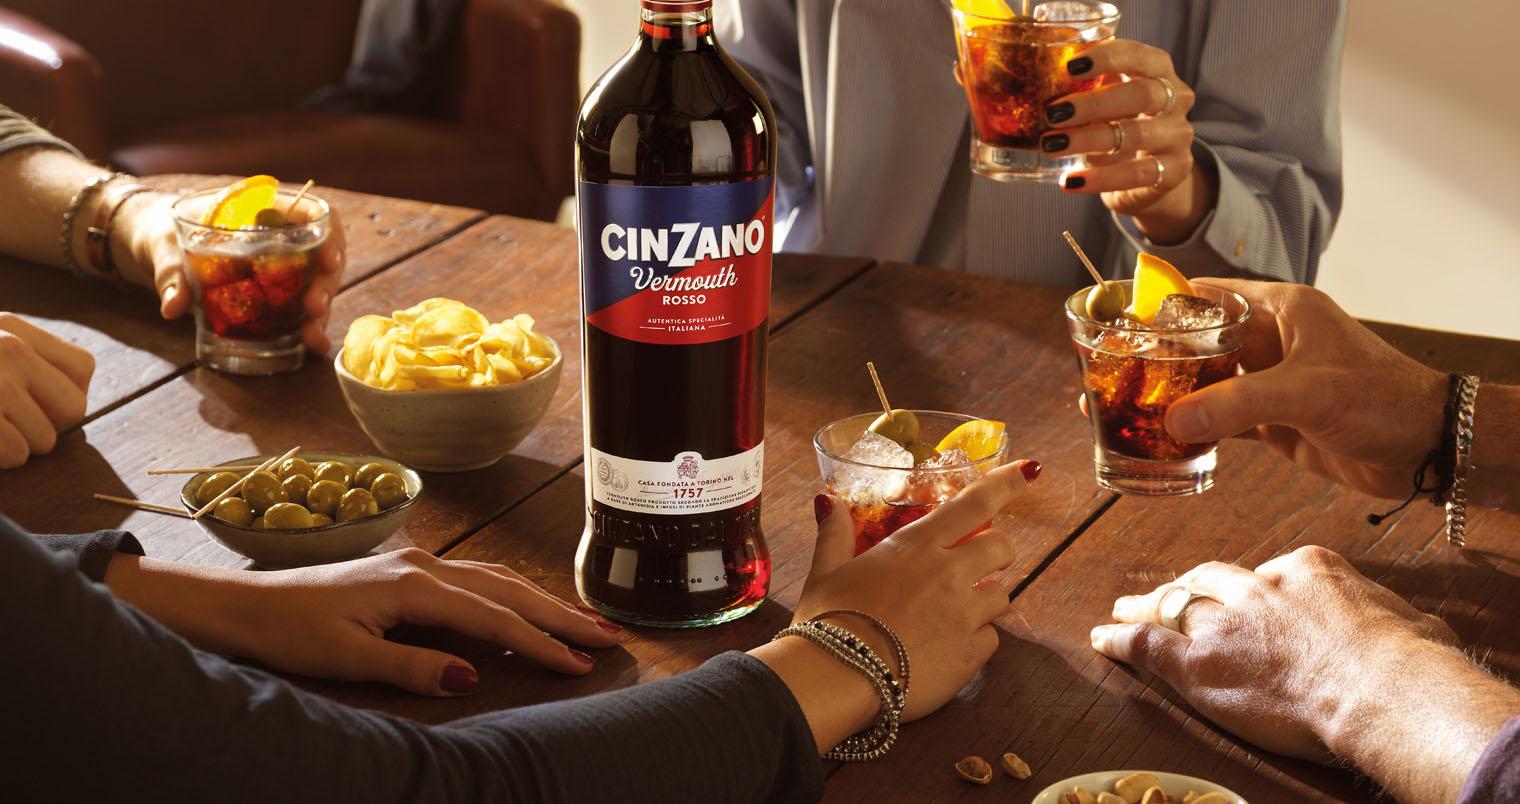 Rosso Vermouth